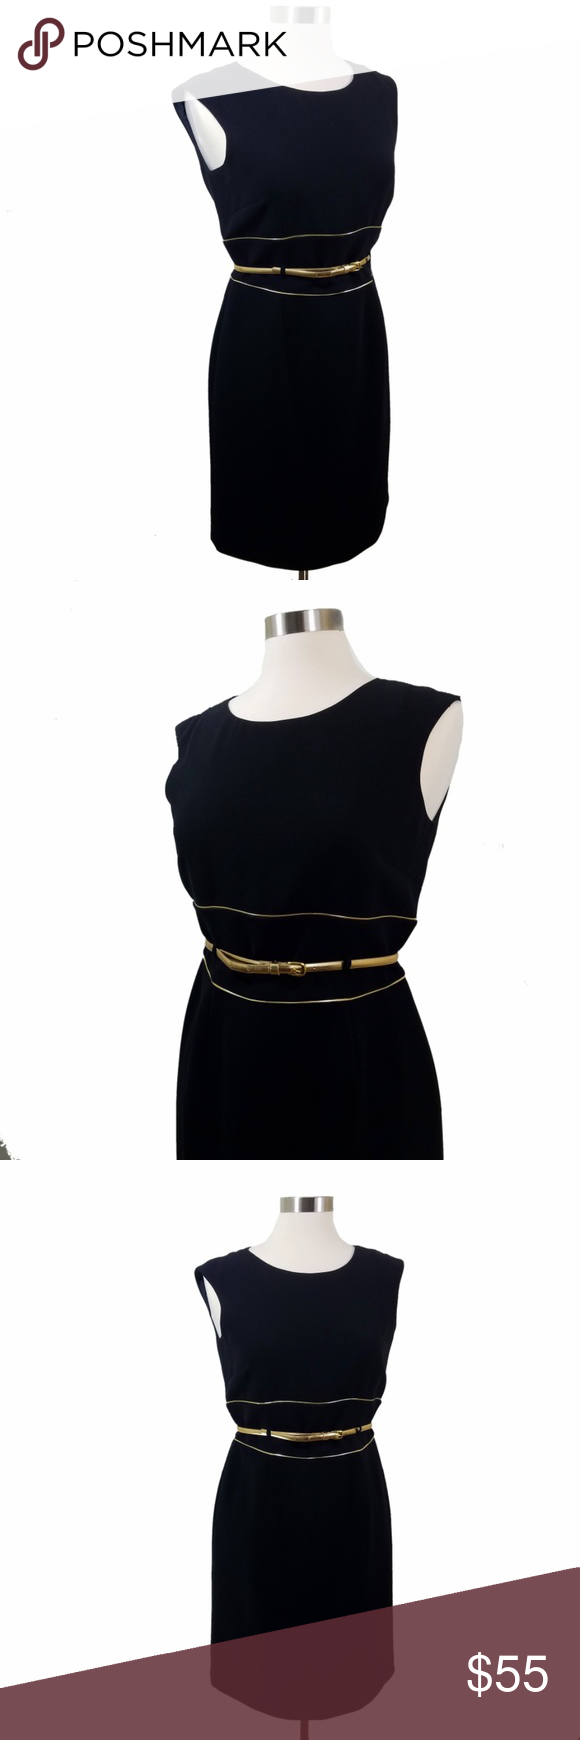 Tahari Black Gold Belted Sheath Cocktail Dress Petite Cocktail Dresses Fashion Clothes Design [ 1740 x 580 Pixel ]